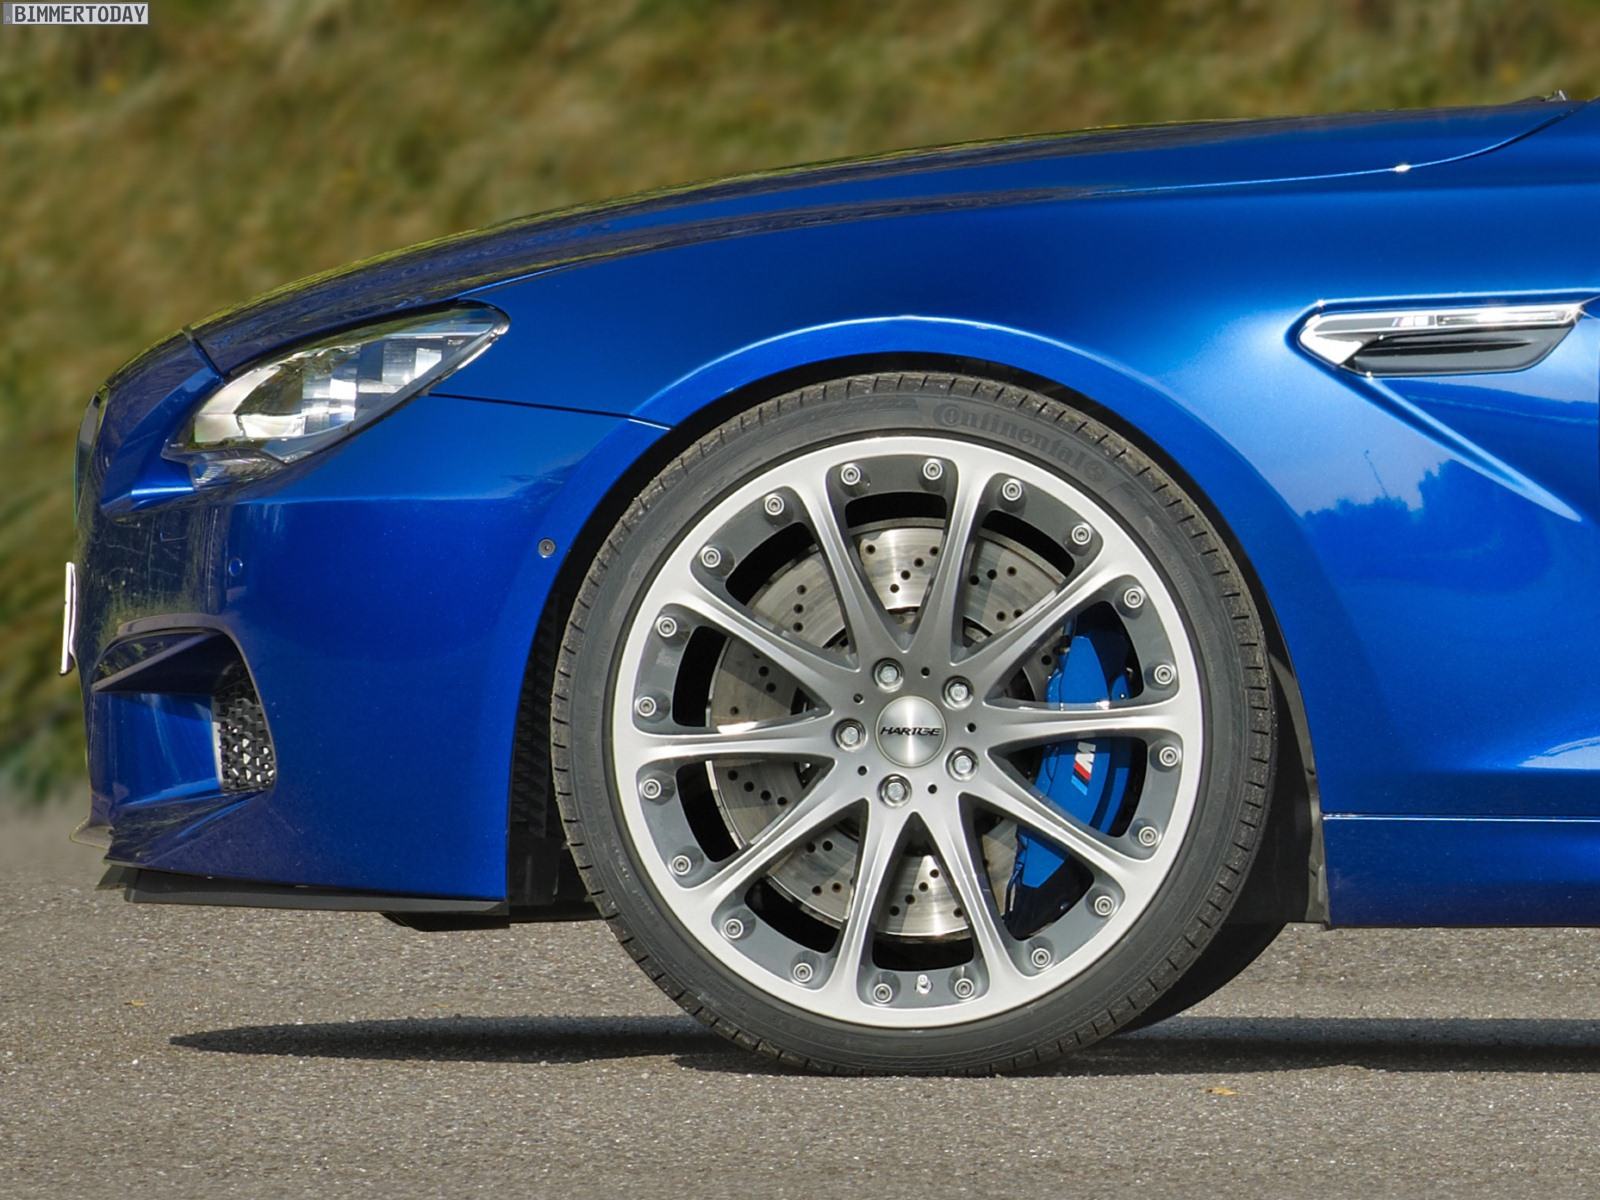 Hartge BMW M6 F13 Tuning 2013 02